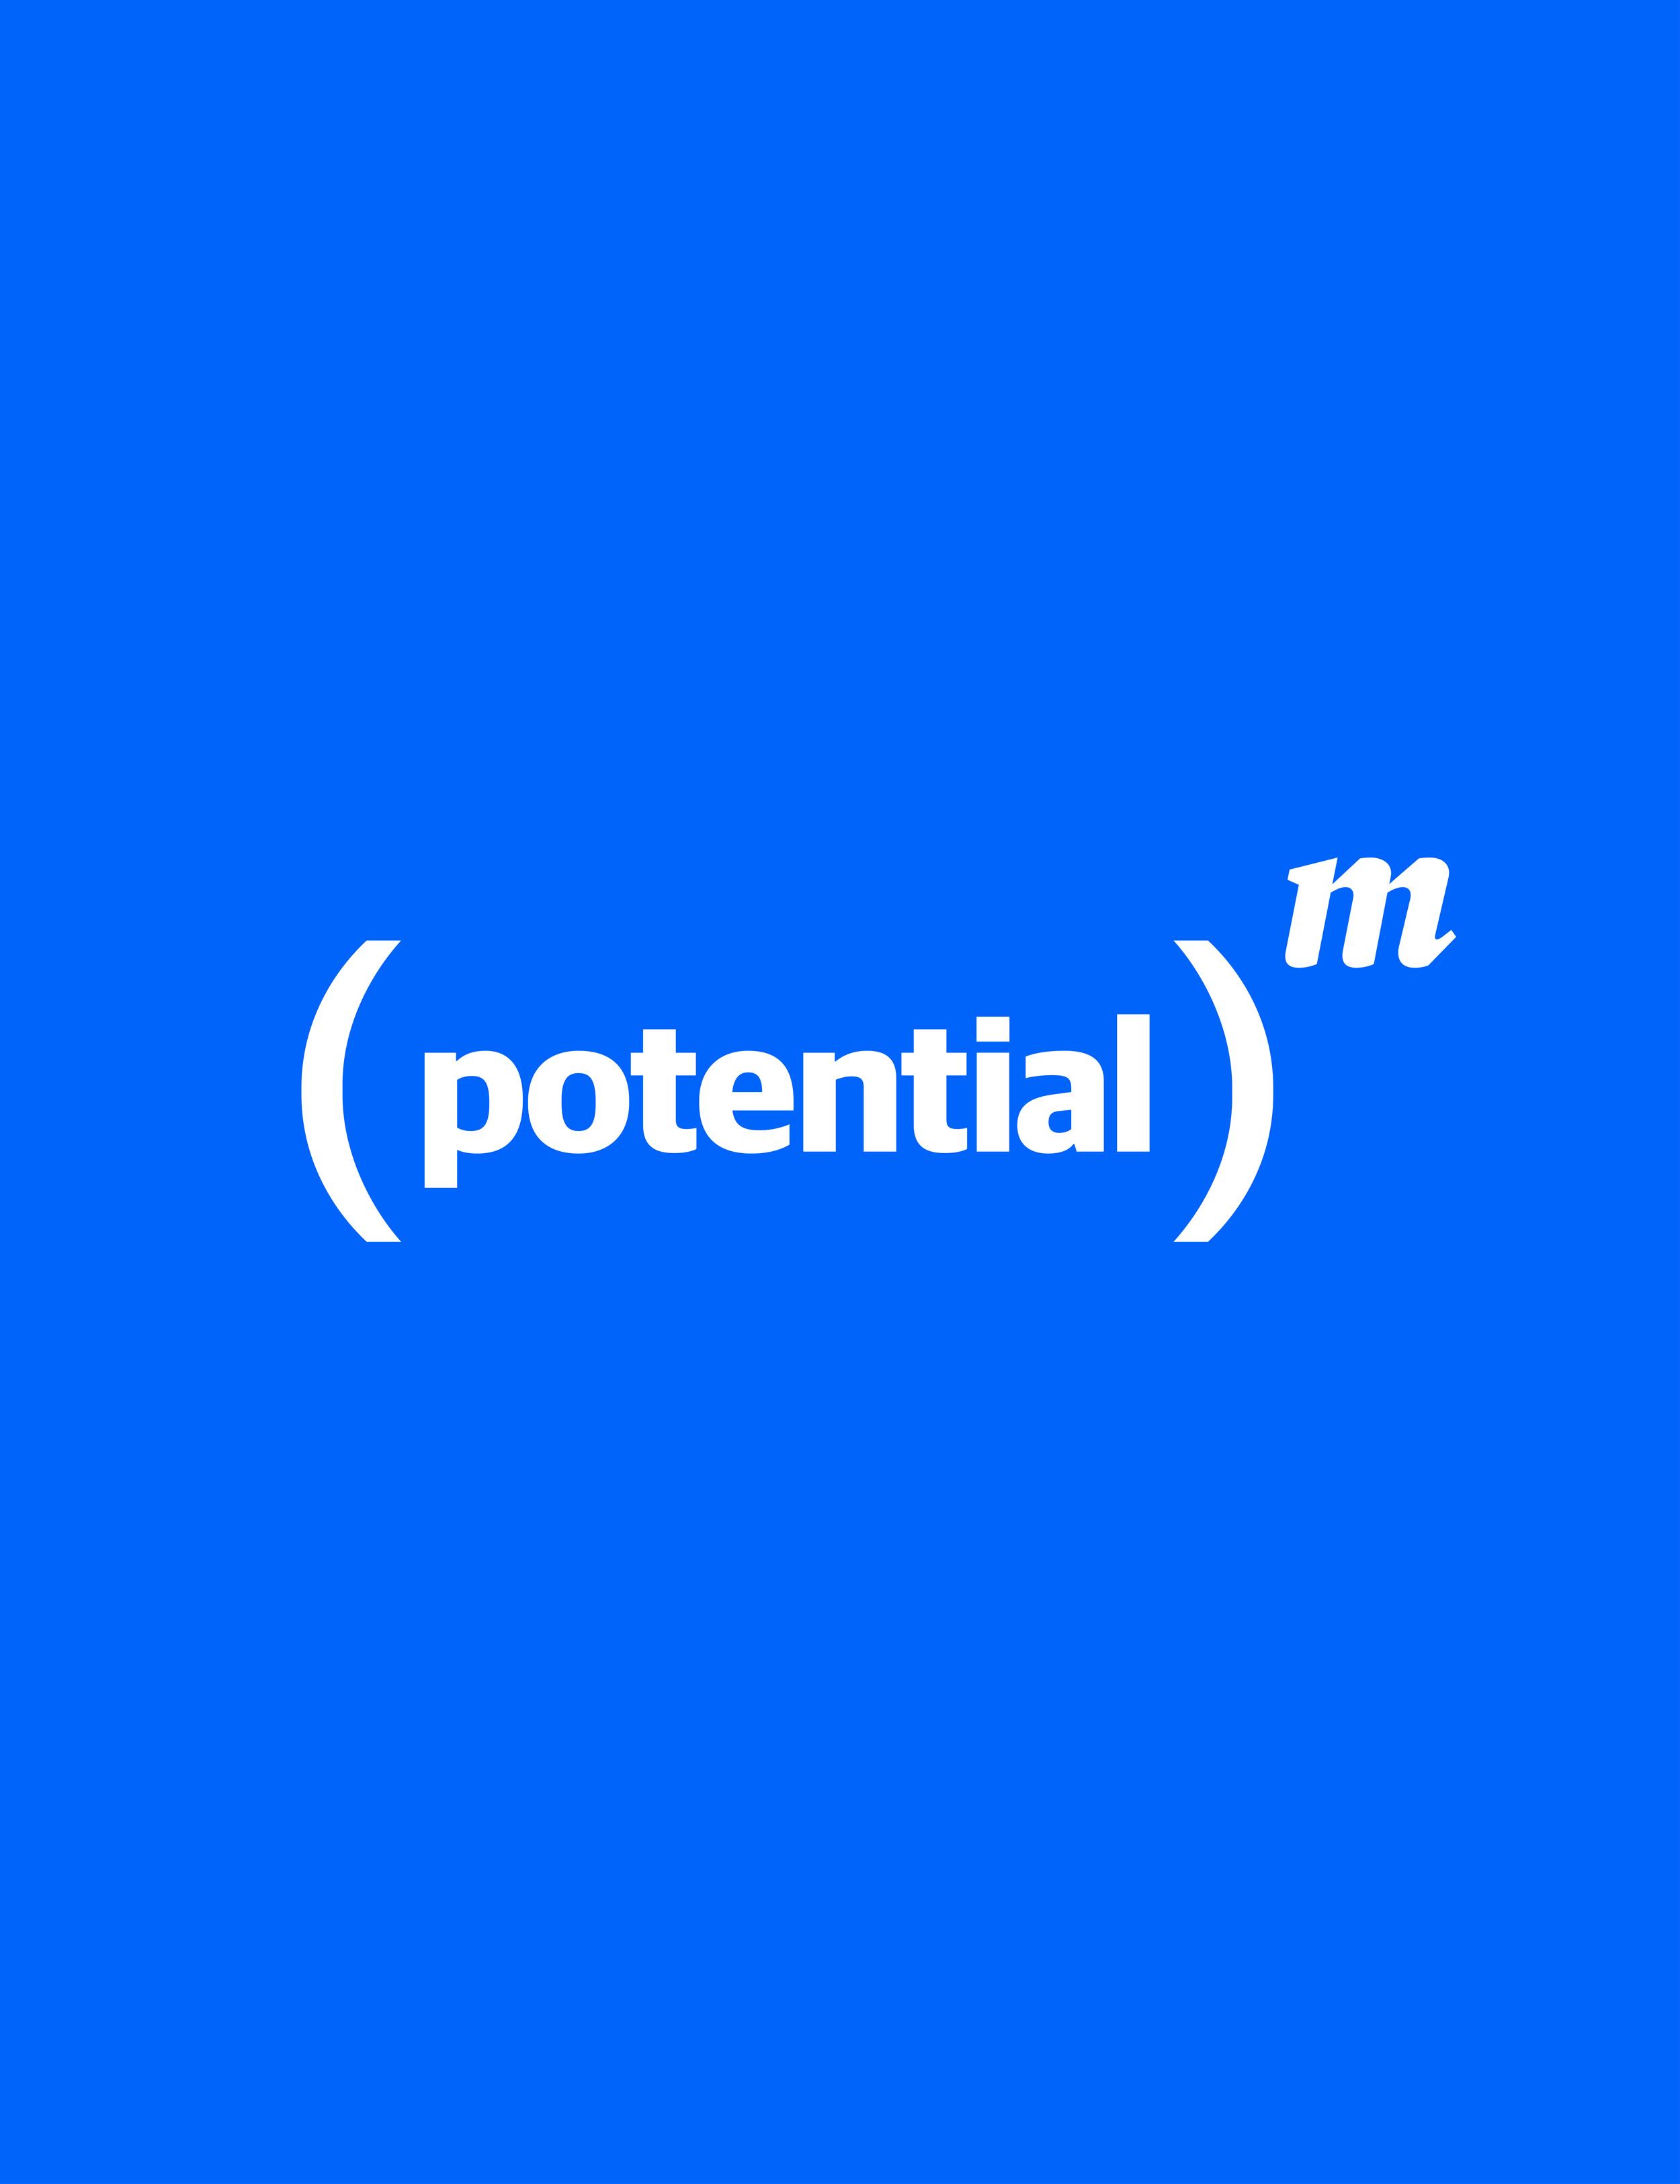 distinc_portfolio_Mirman_Word_Carousel1.jpg